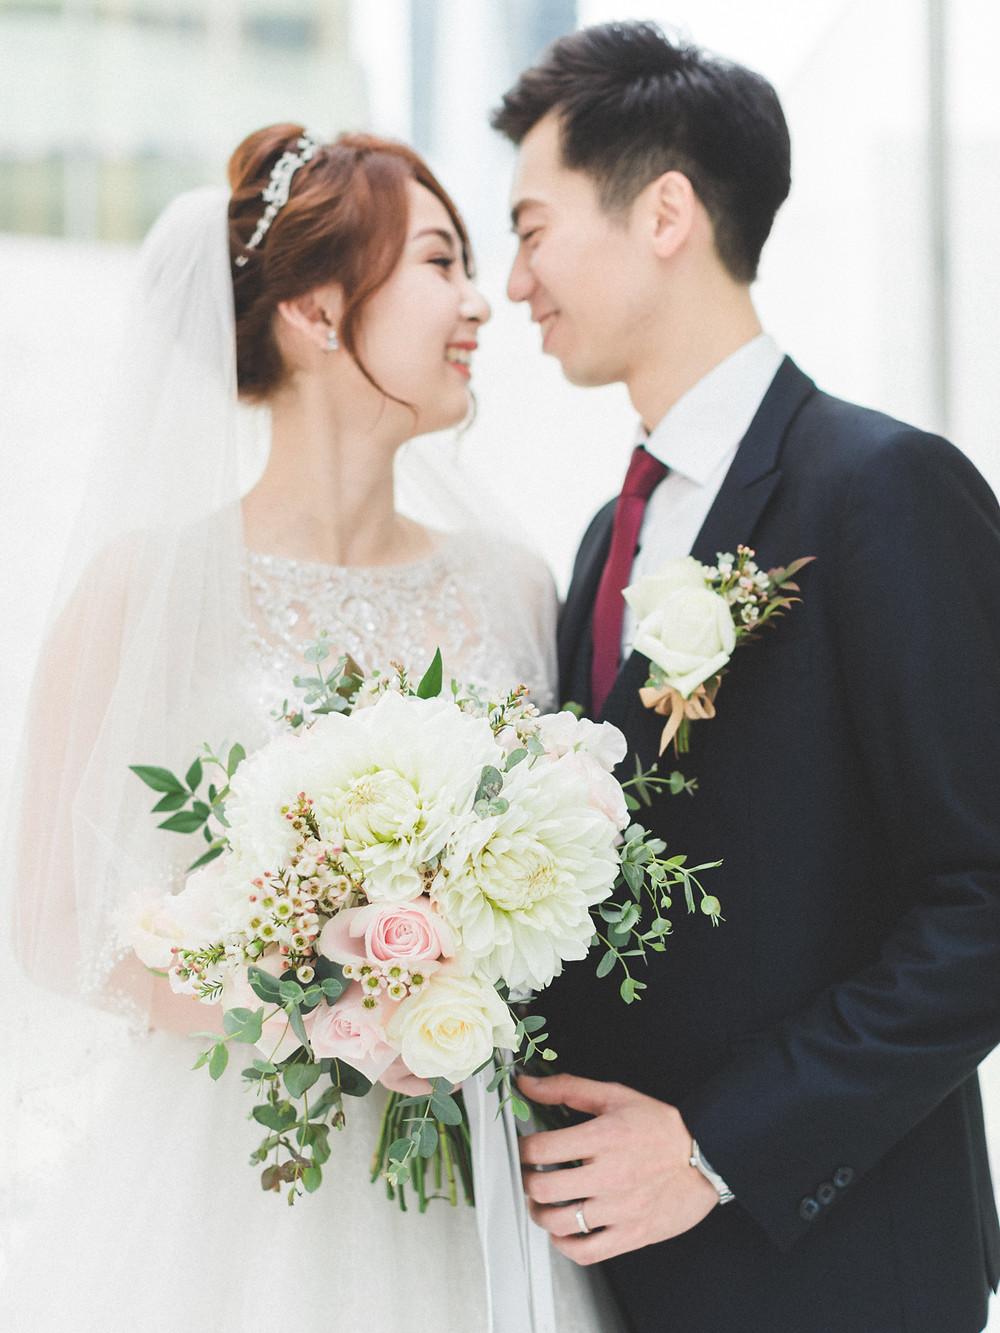 Trista & LorenzoWedding |  Denwell 新莊典華, Taiwan Arther Chen Photography美式婚禮